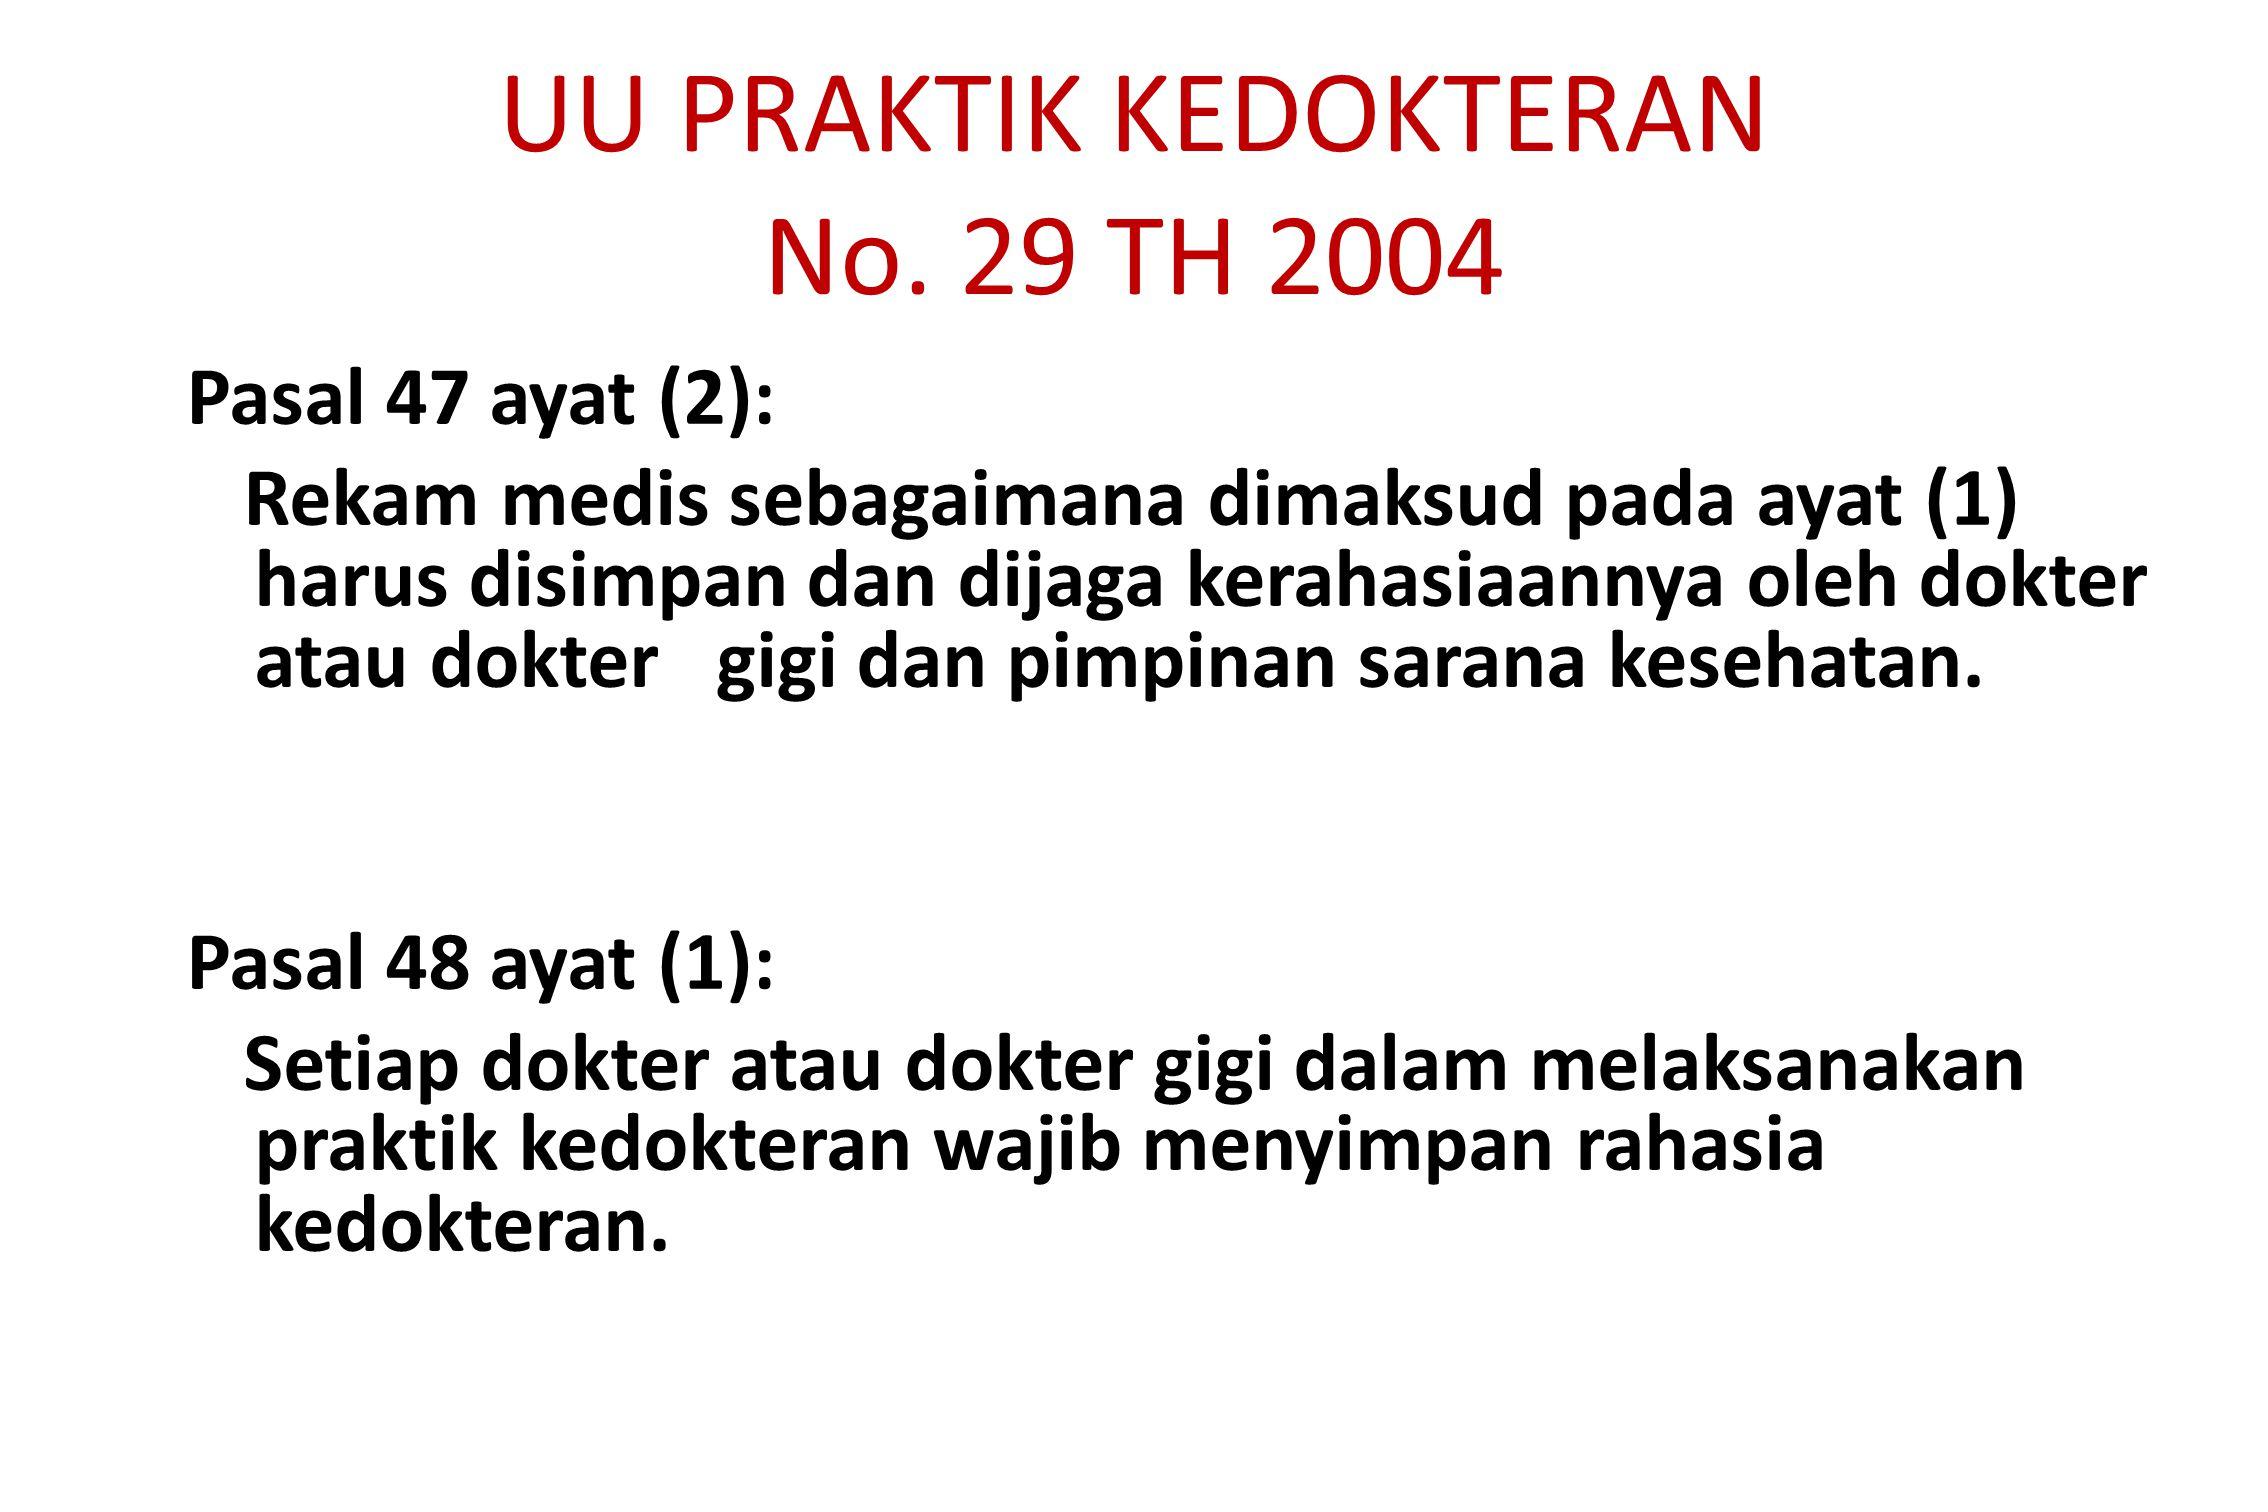 UU PRAKTIK KEDOKTERAN No. 29 TH 2004 Pasal 47 ayat (2): Rekam medis sebagaimana dimaksud pada ayat (1) harus disimpan dan dijaga kerahasiaannya oleh d